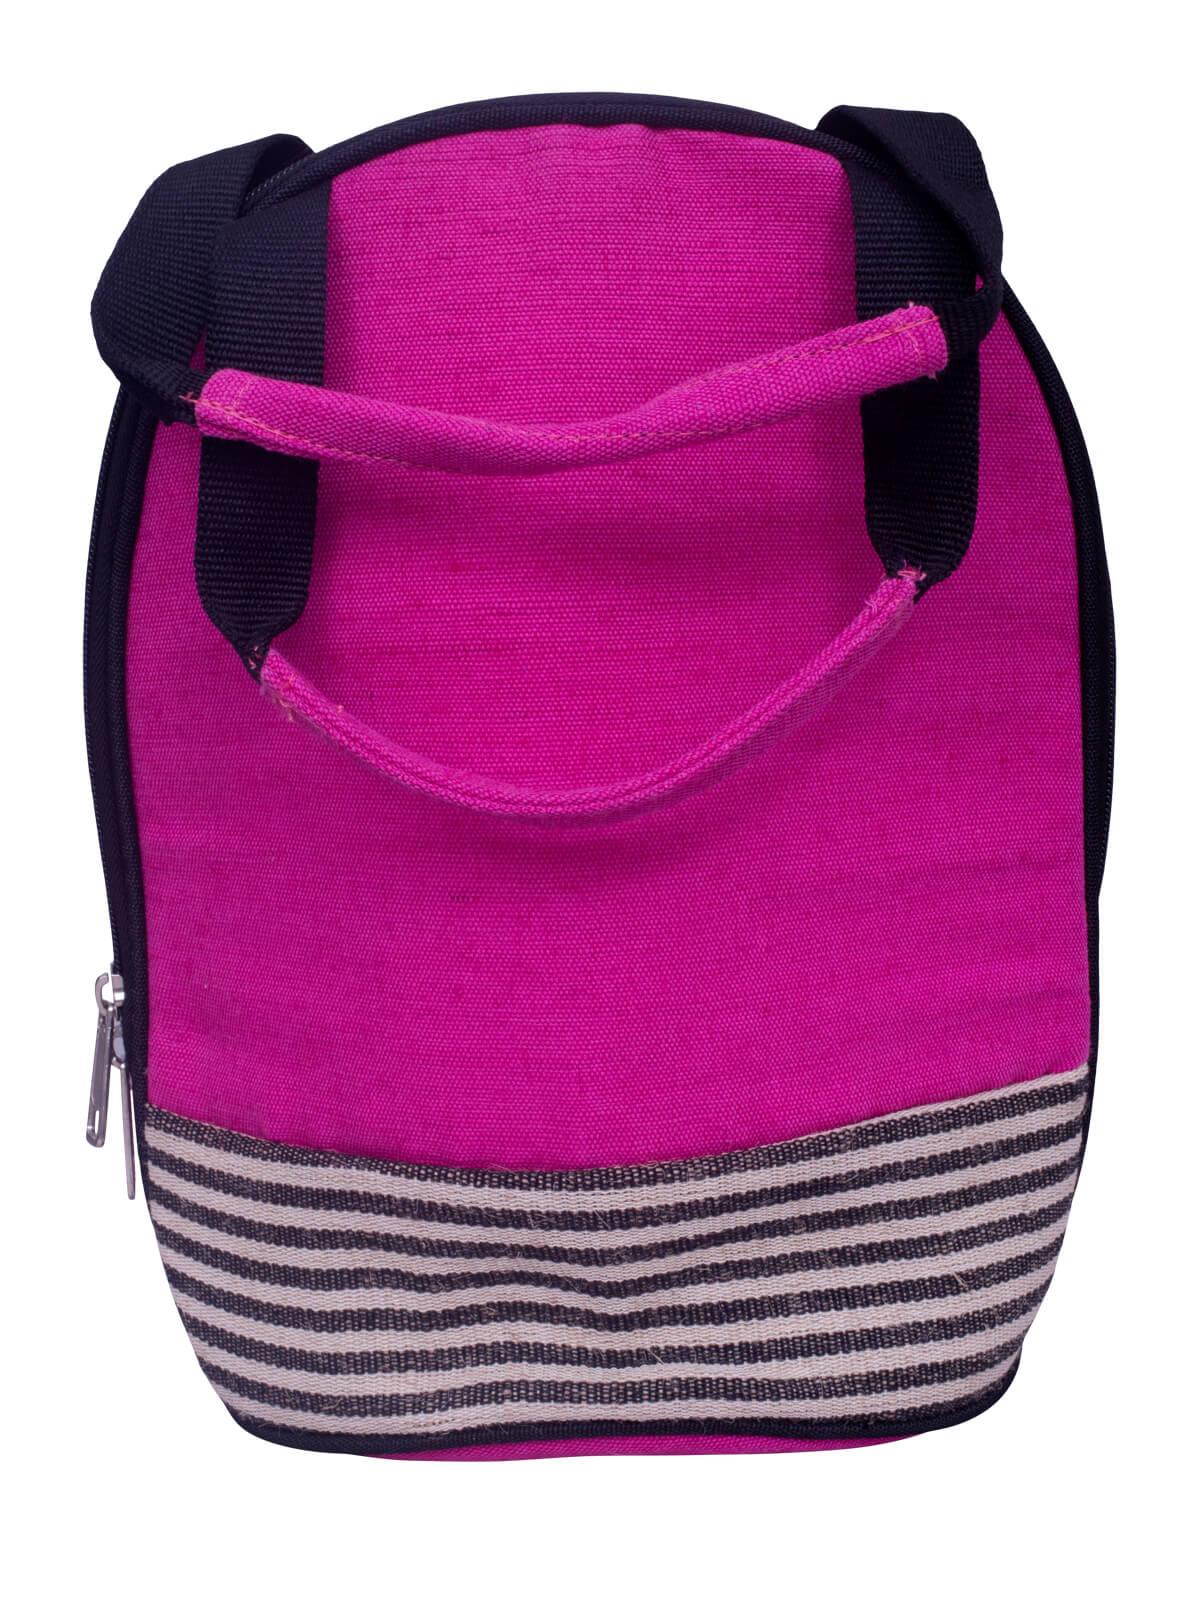 Pink Jute Lunch Bag